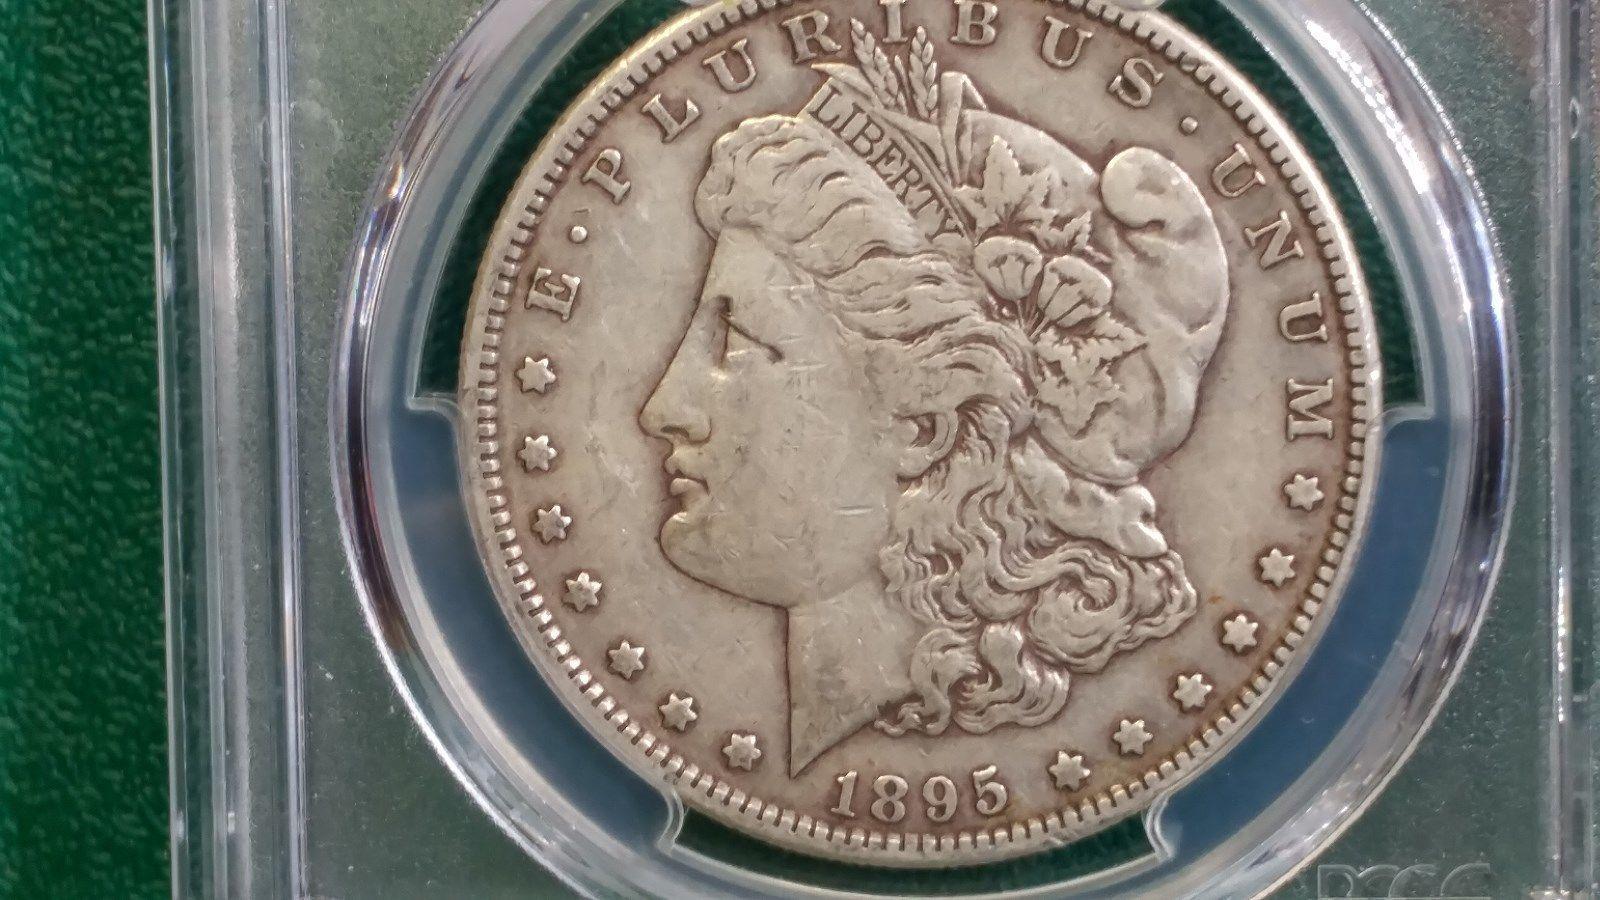 1895S 1 Silver Dollar VF35 !! WOW PCGS PRICE